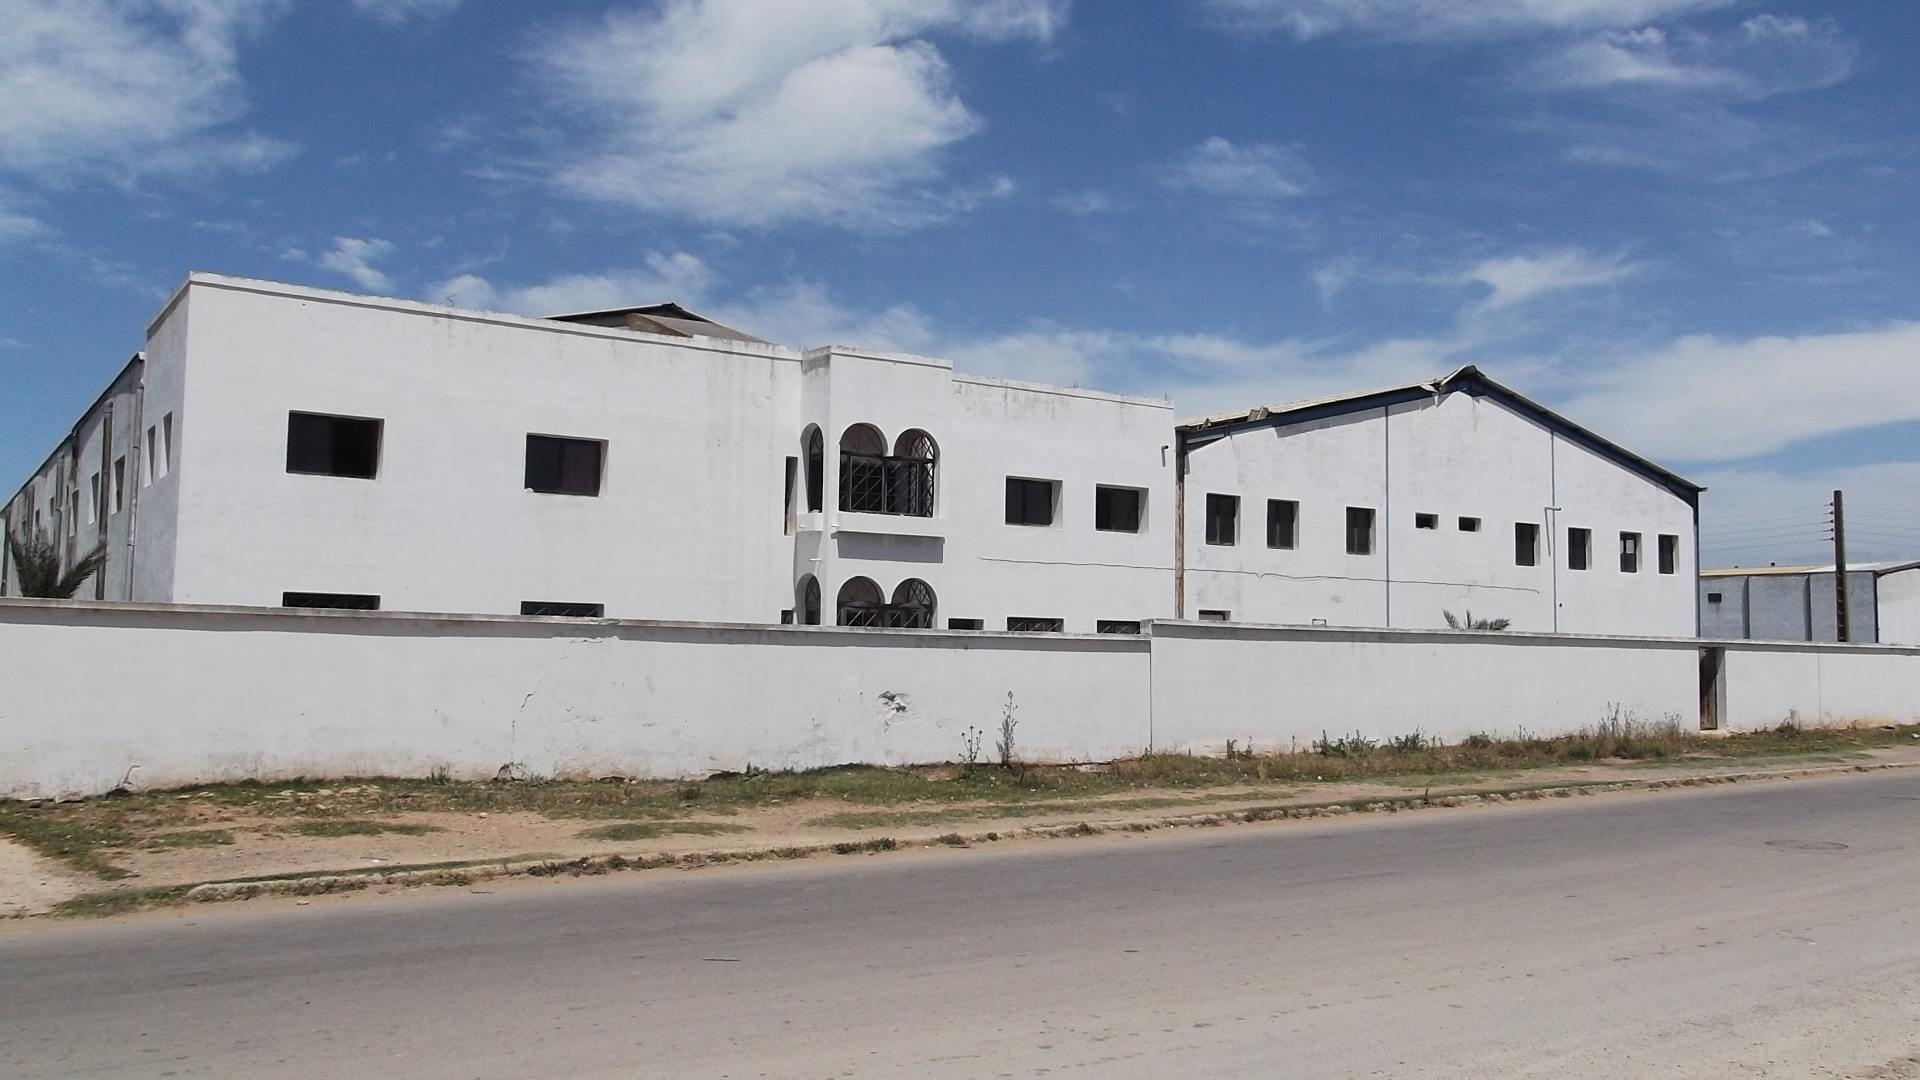 vente usine eljadida maroc usine vendre eljadida pas cher. Black Bedroom Furniture Sets. Home Design Ideas